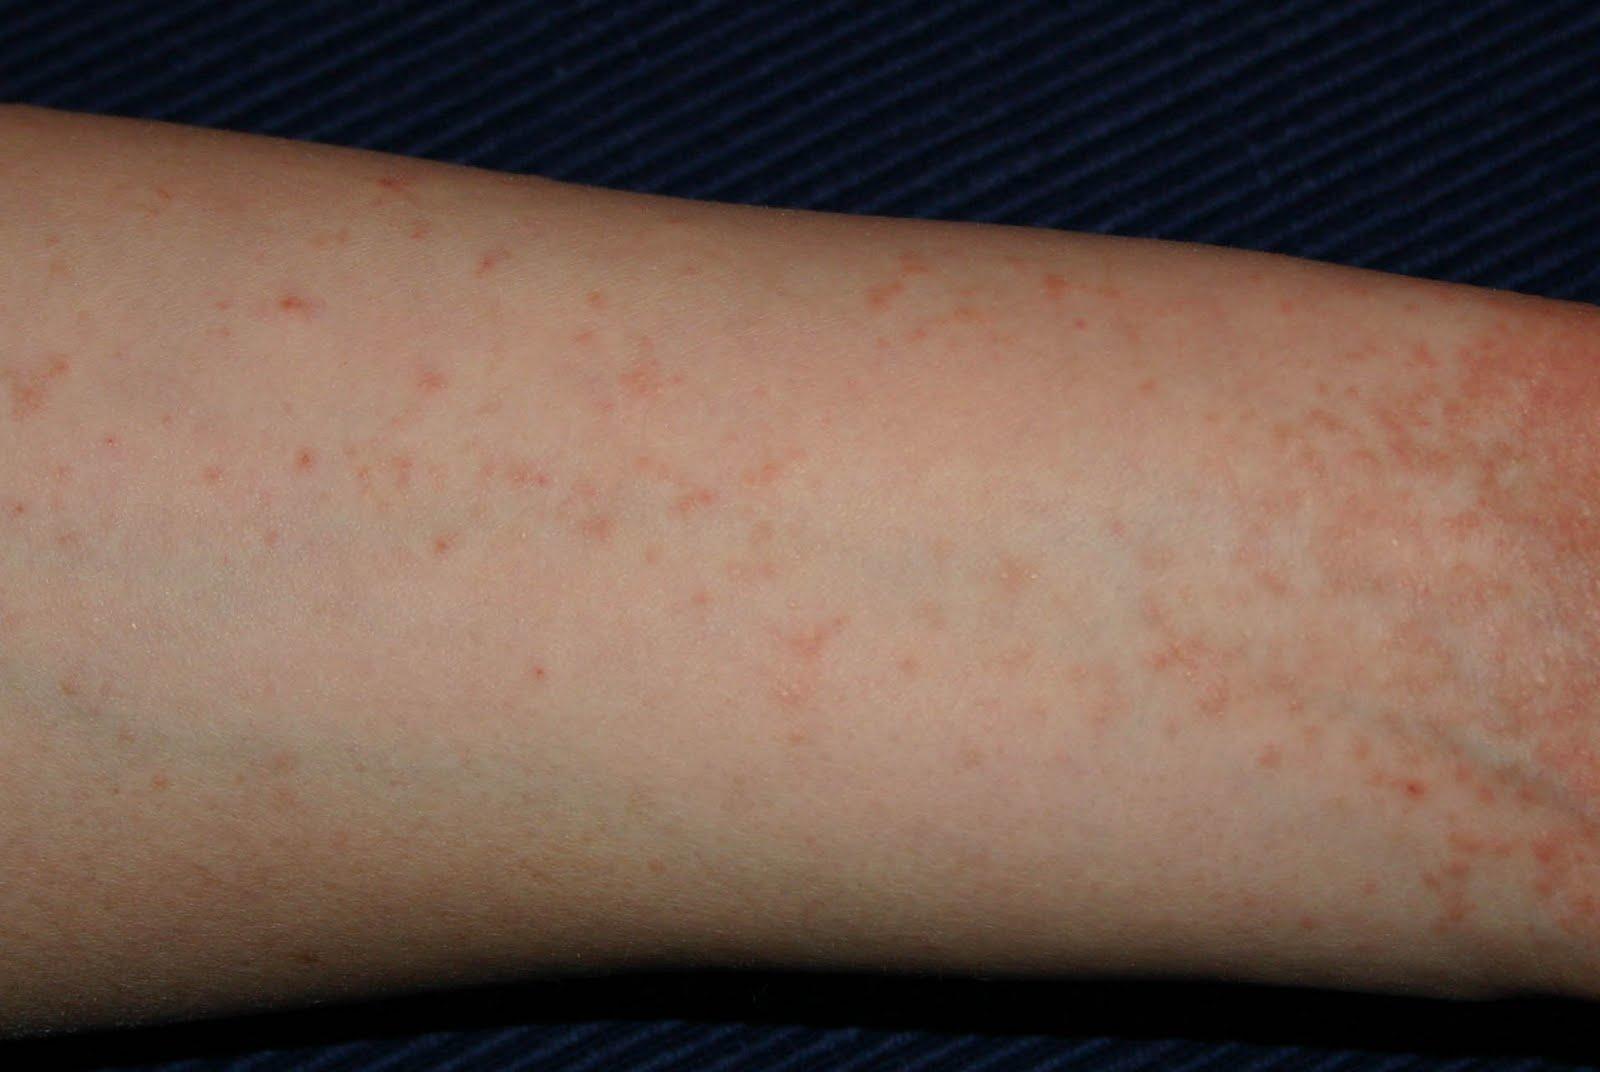 mit kezdjen a lábakon lévő piros foltokkal